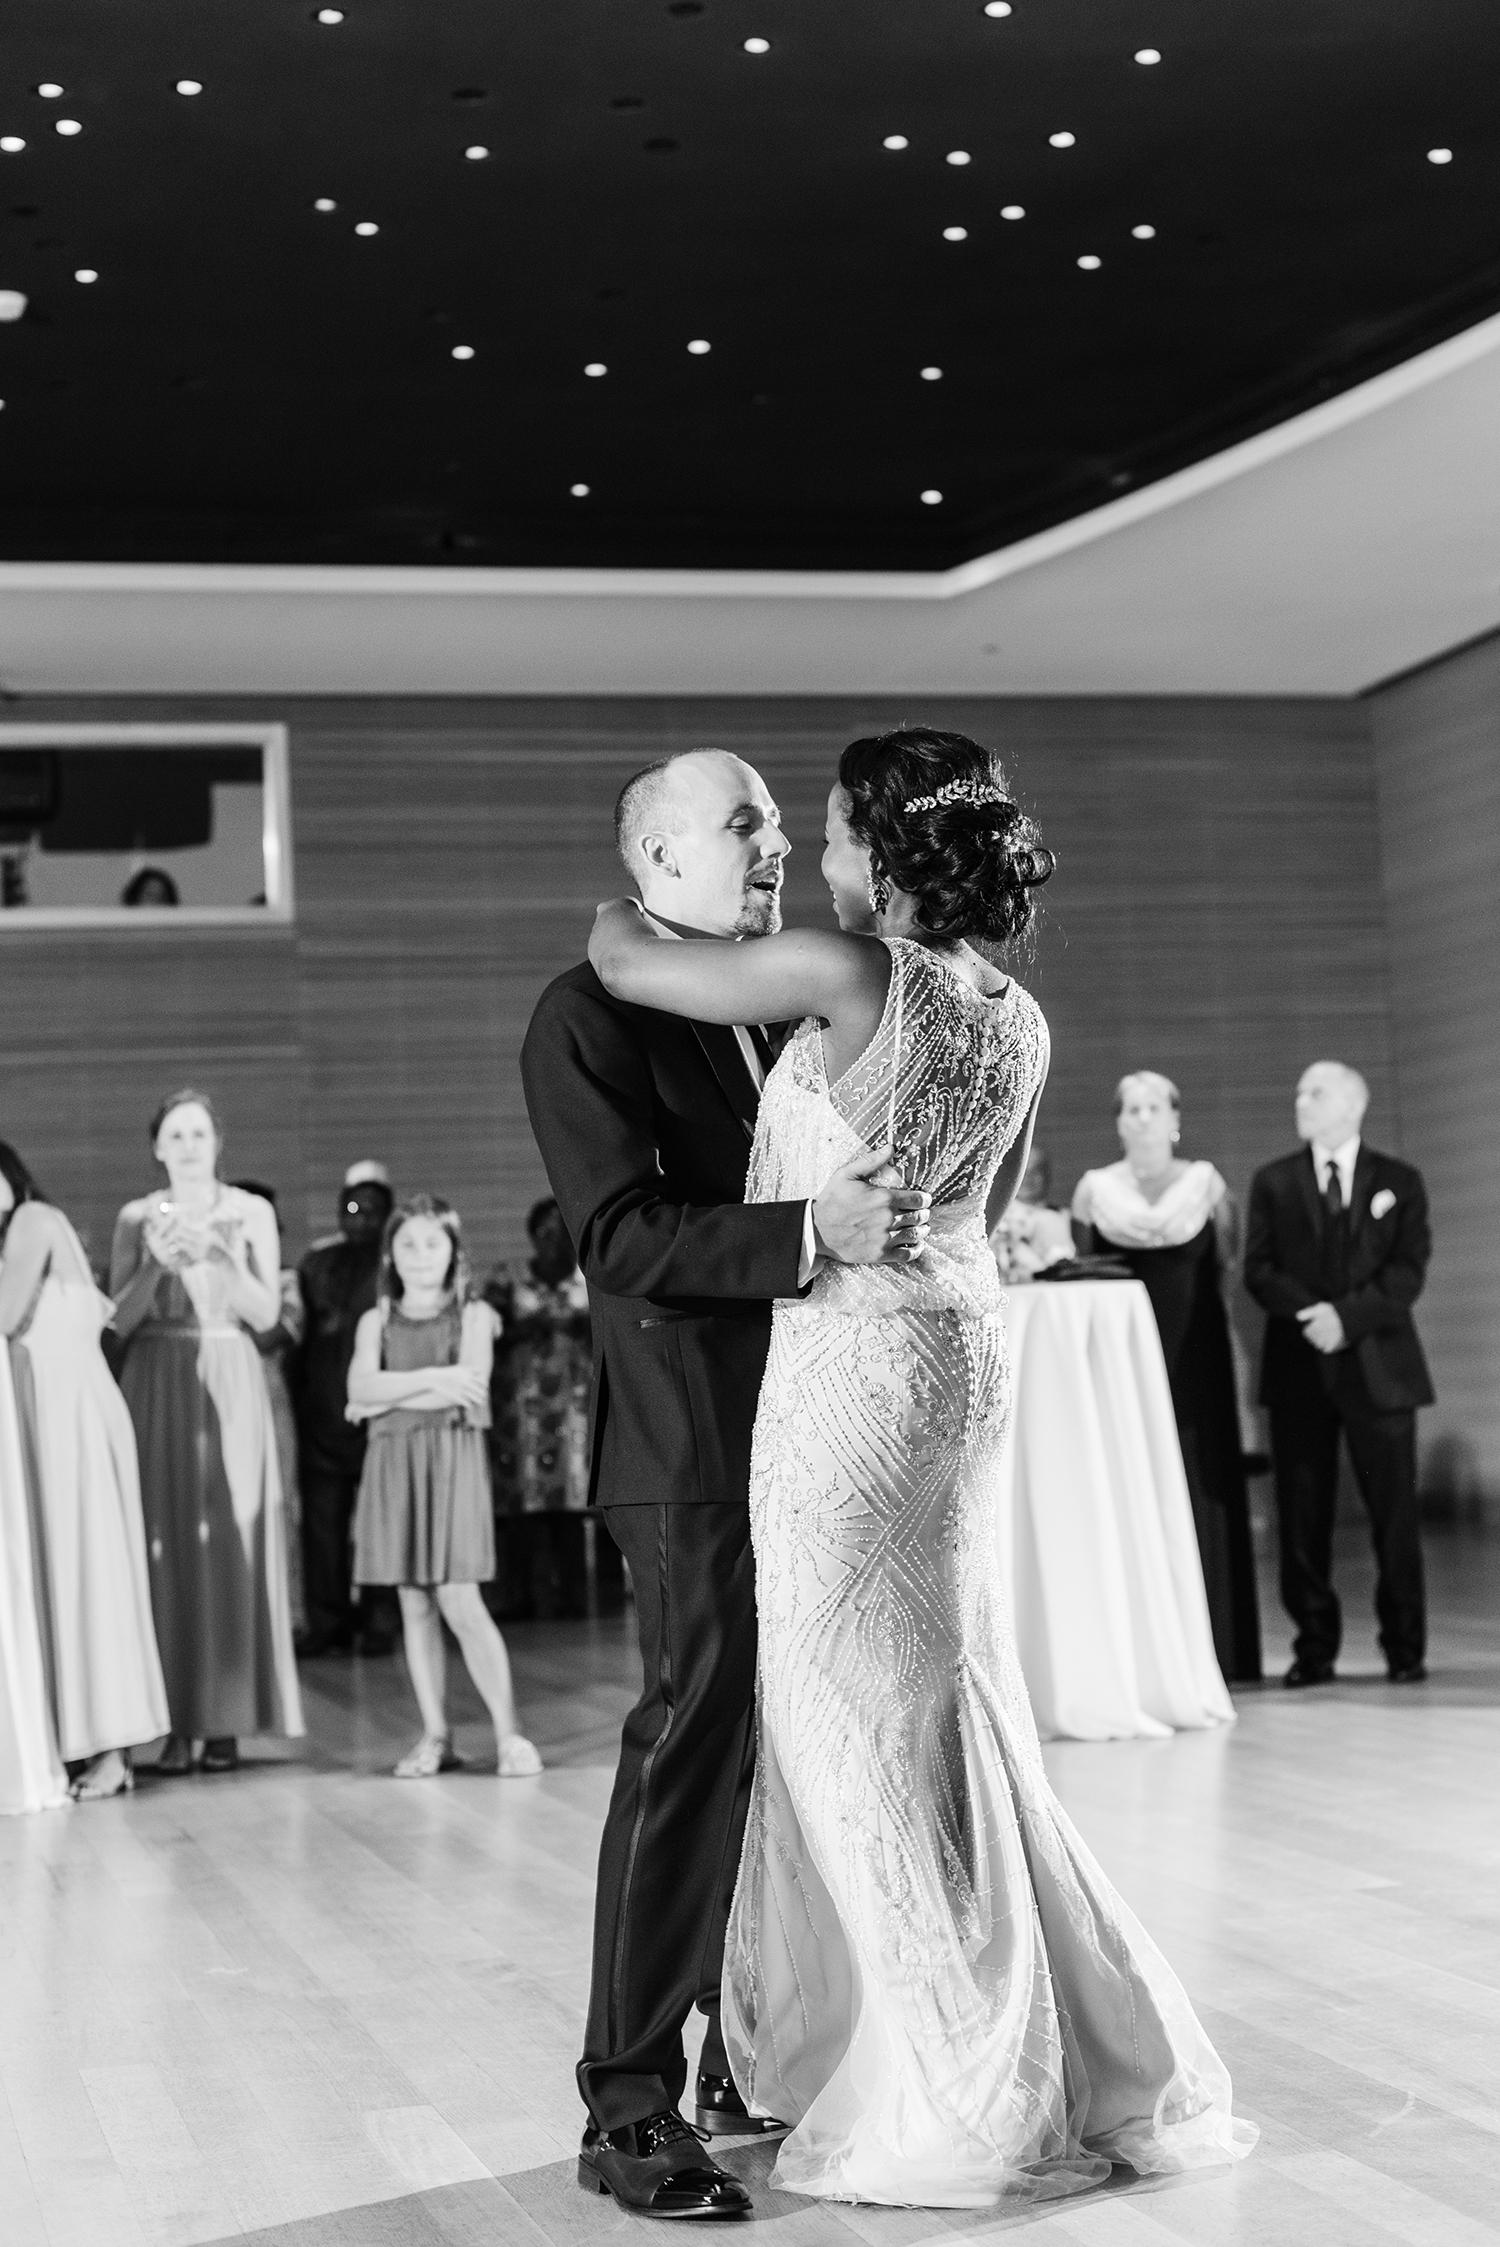 anwuli patrick wedding first dance couple